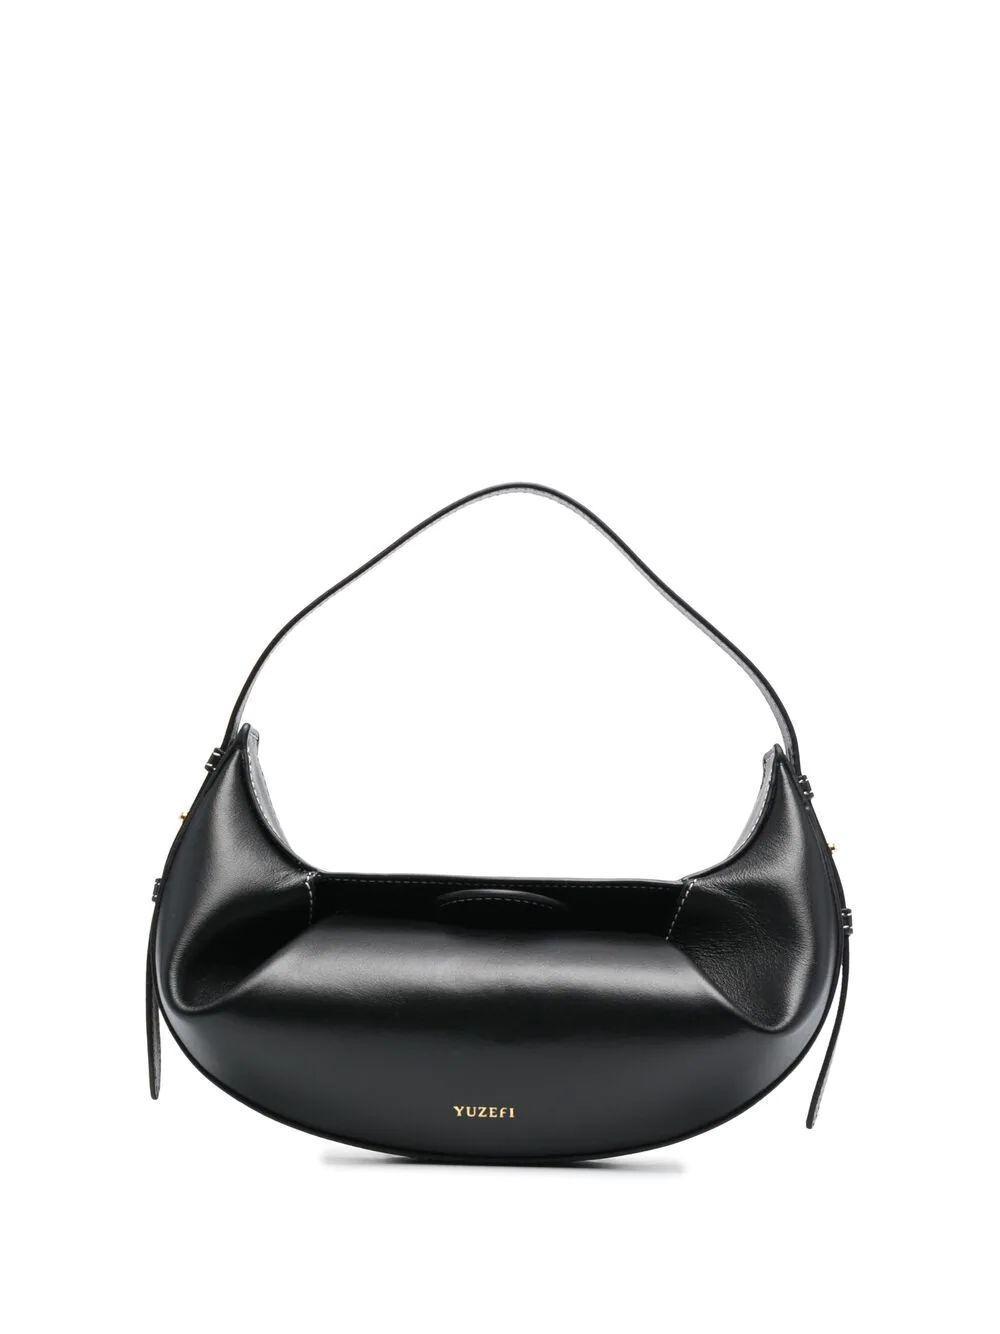 Mini Fortune Cookie Shoulder Bag Item # YUZCO-HB-FM-00